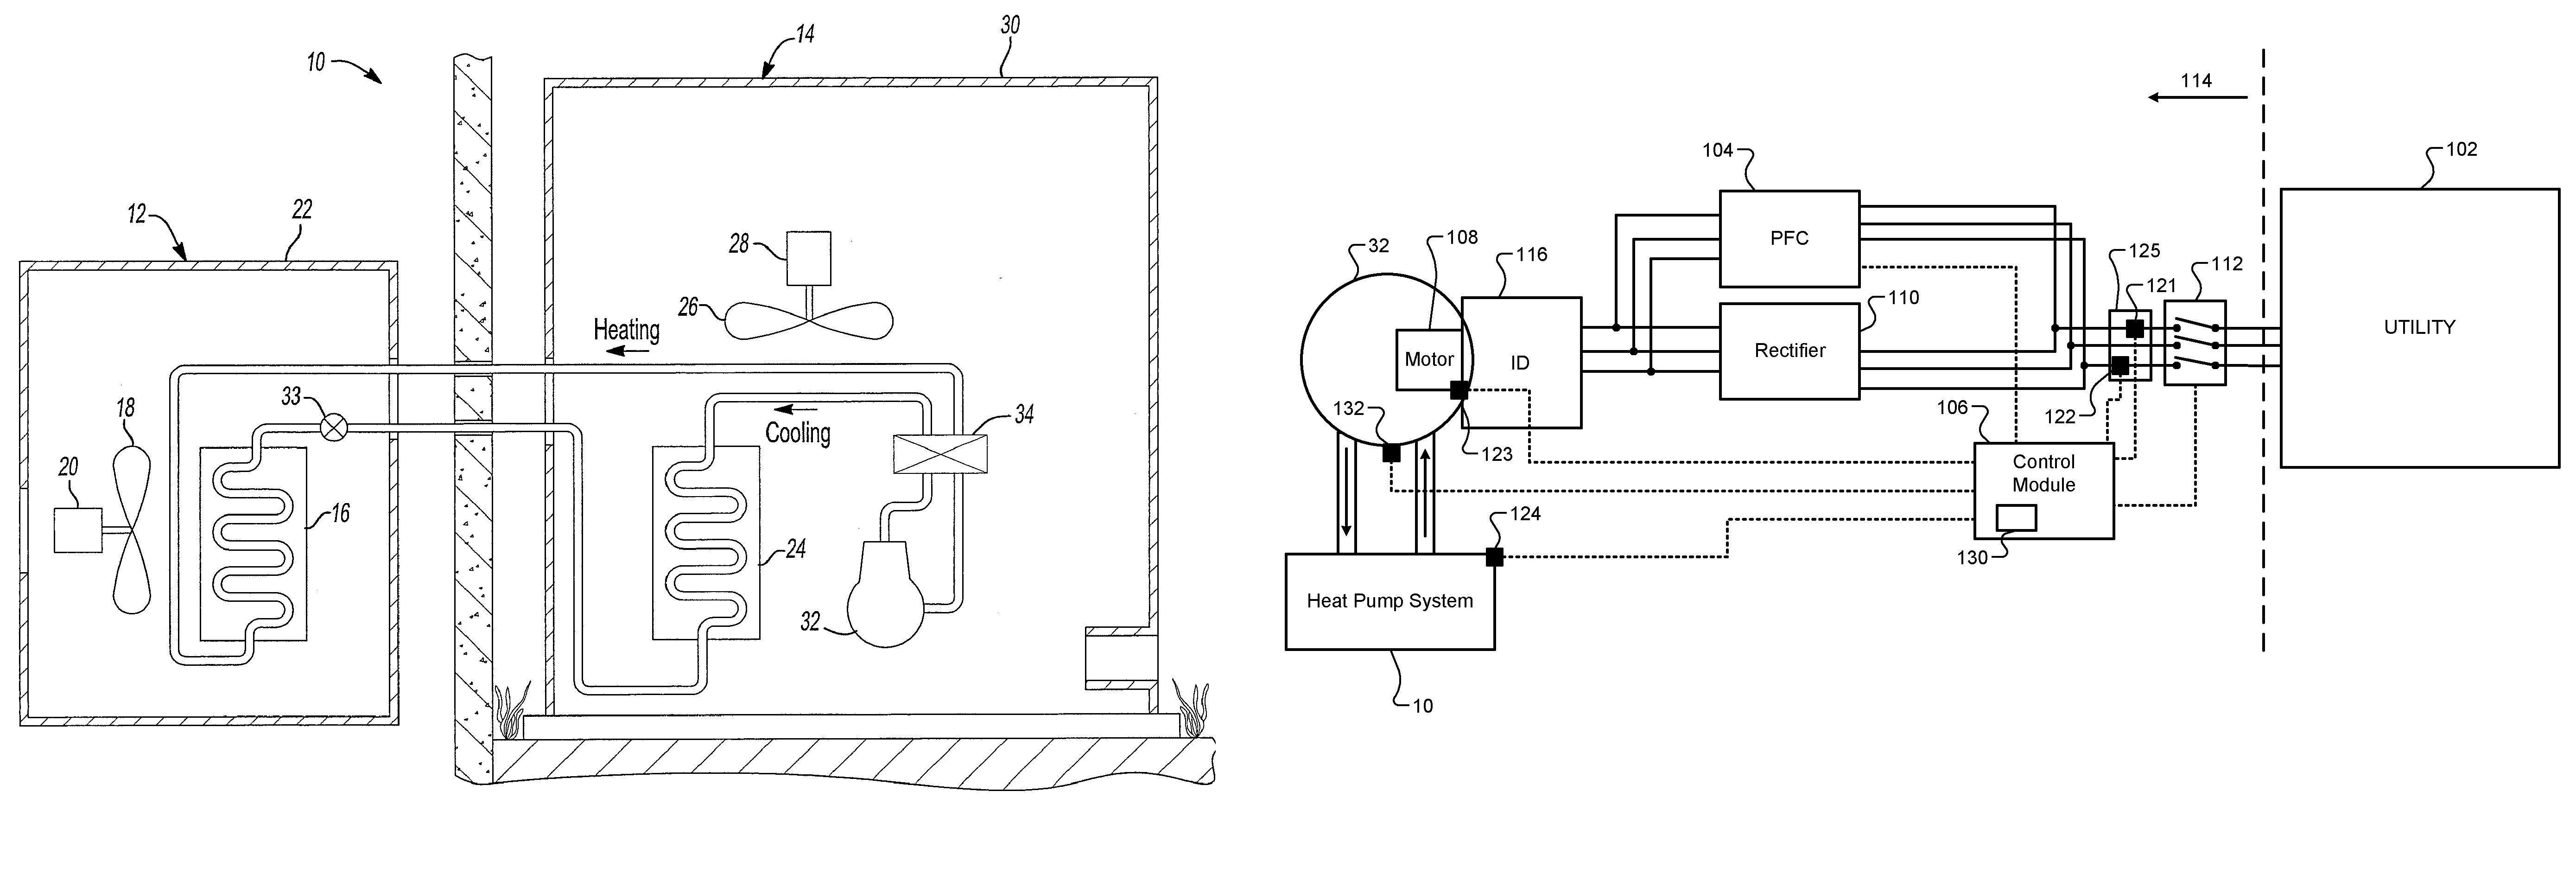 Patent US 9,876,346 B2